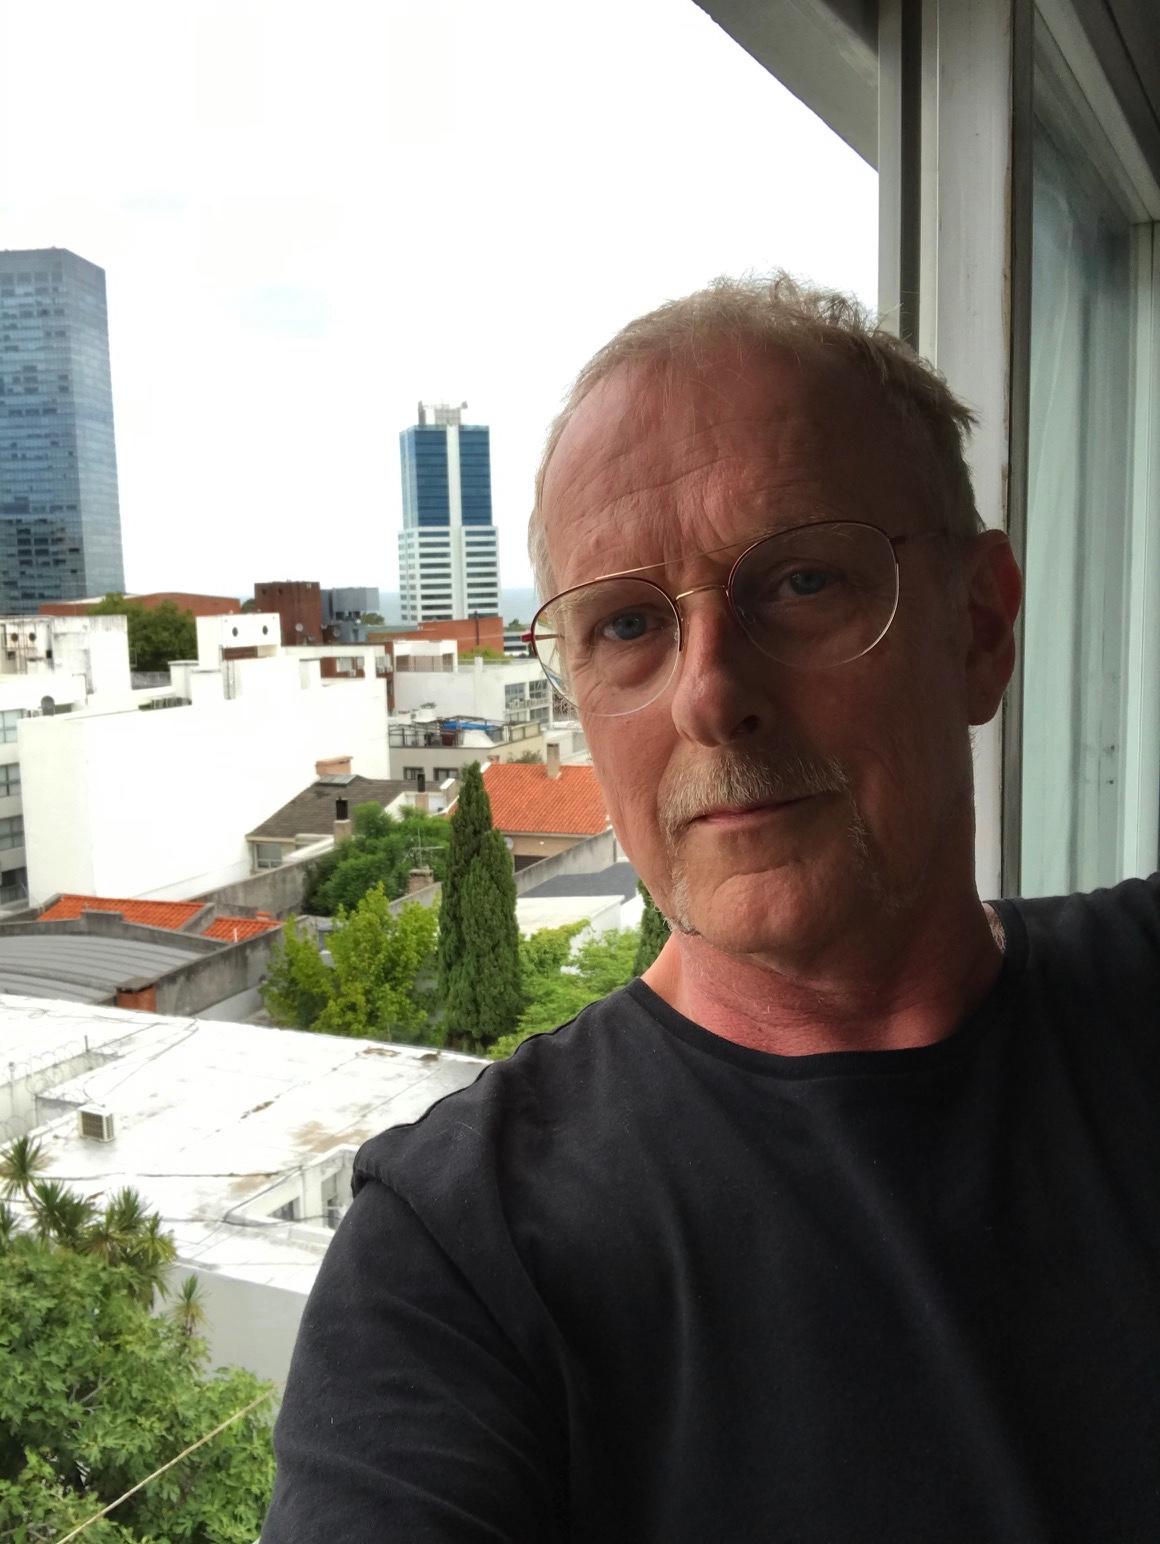 Interview: 10 Fragen an Ekkehard Lampe-Steinhage  klassik-begeistert.de